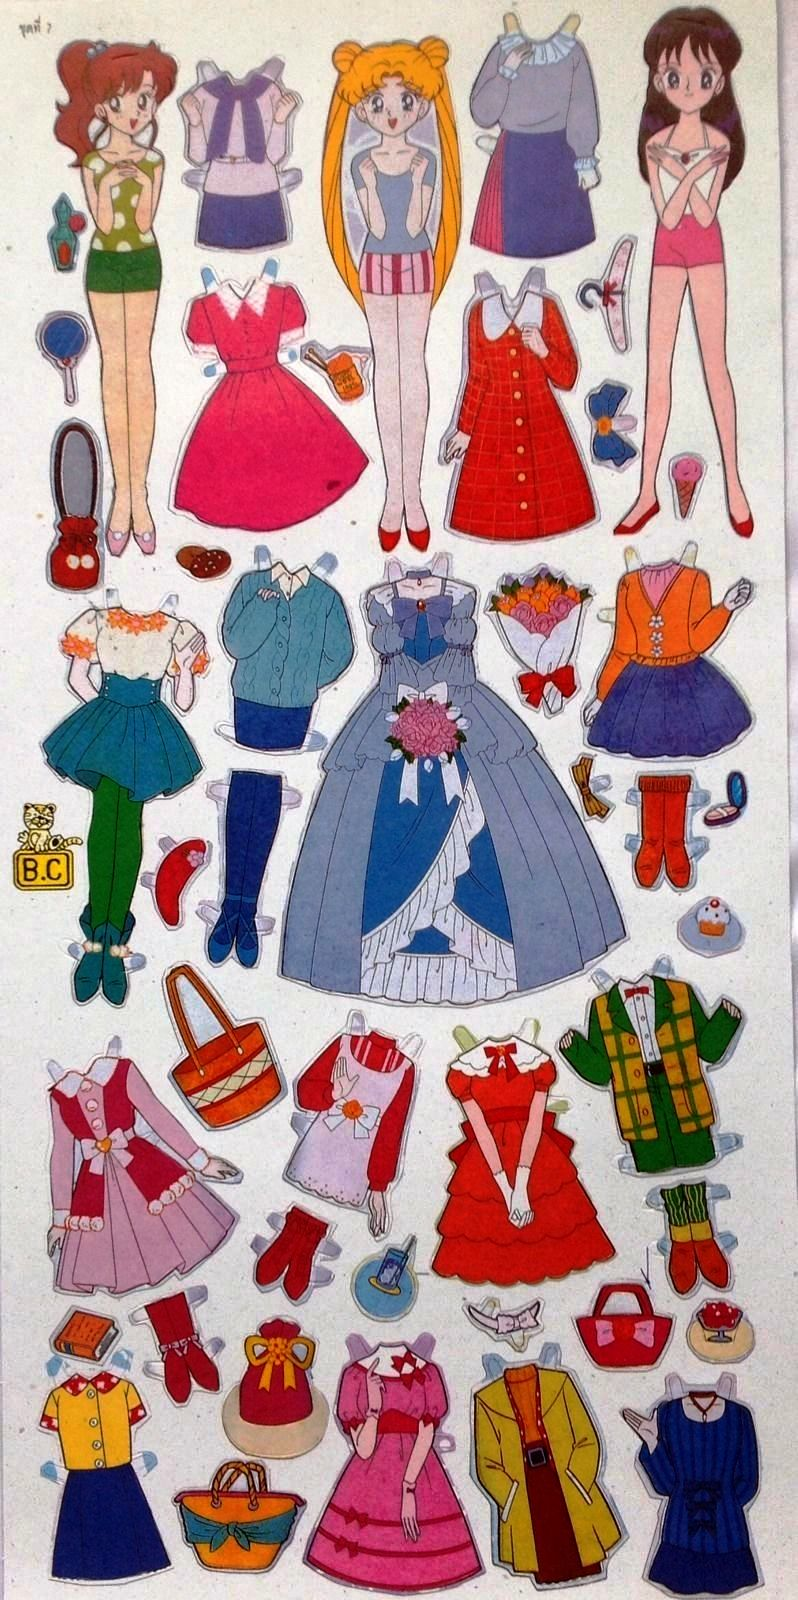 mbah bepe paper doll sailor moon